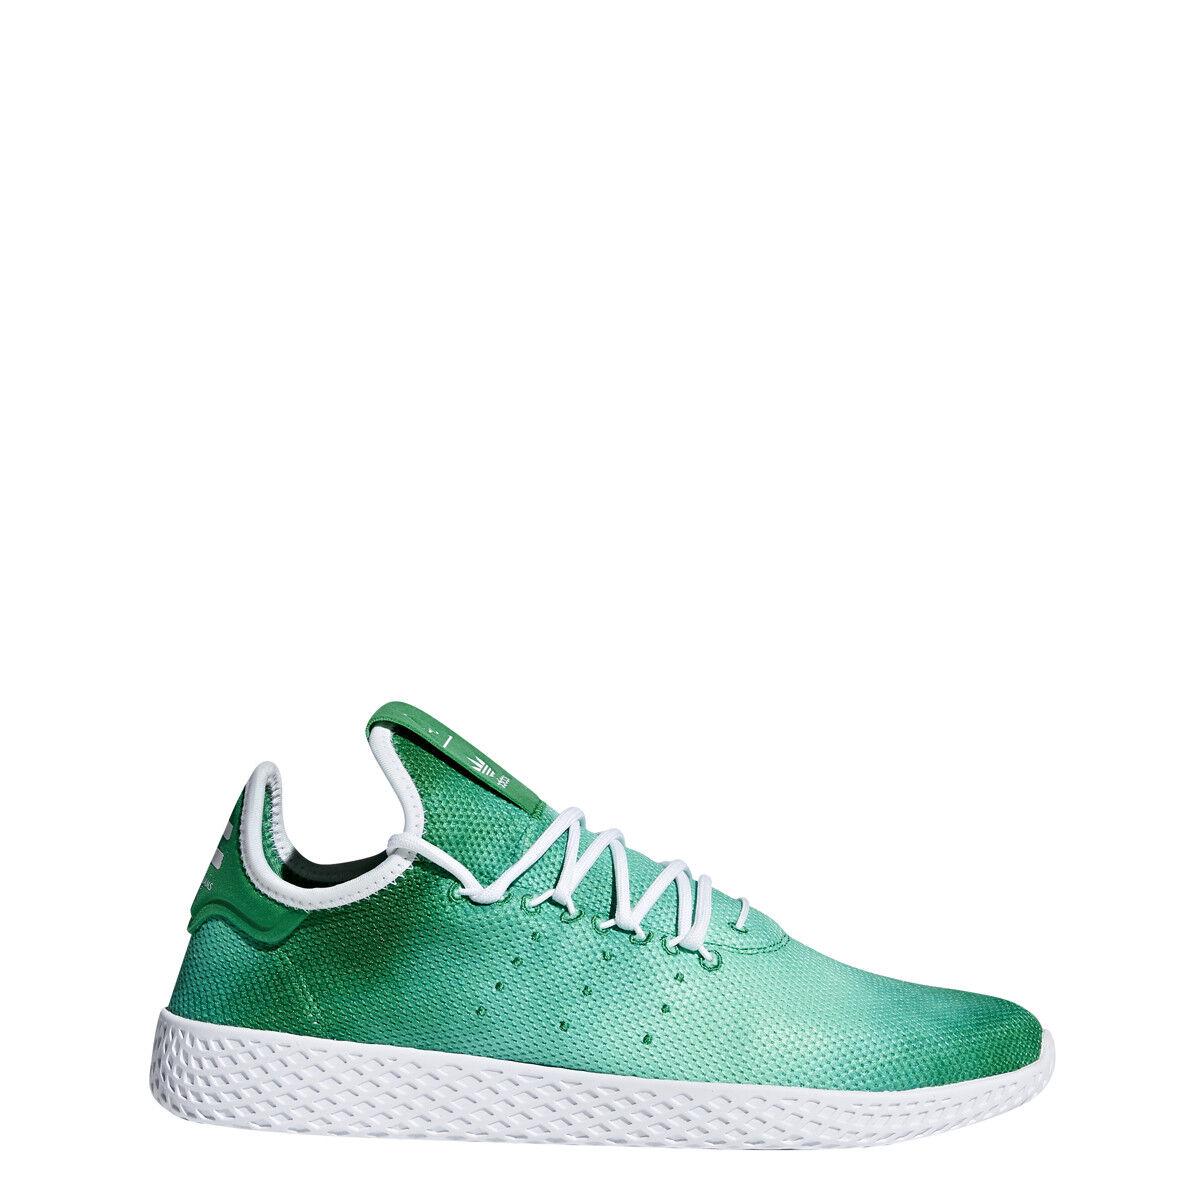 Adidas Uomo pw hu holi tennis hu verde / bianco / in bianco - da9619 correre